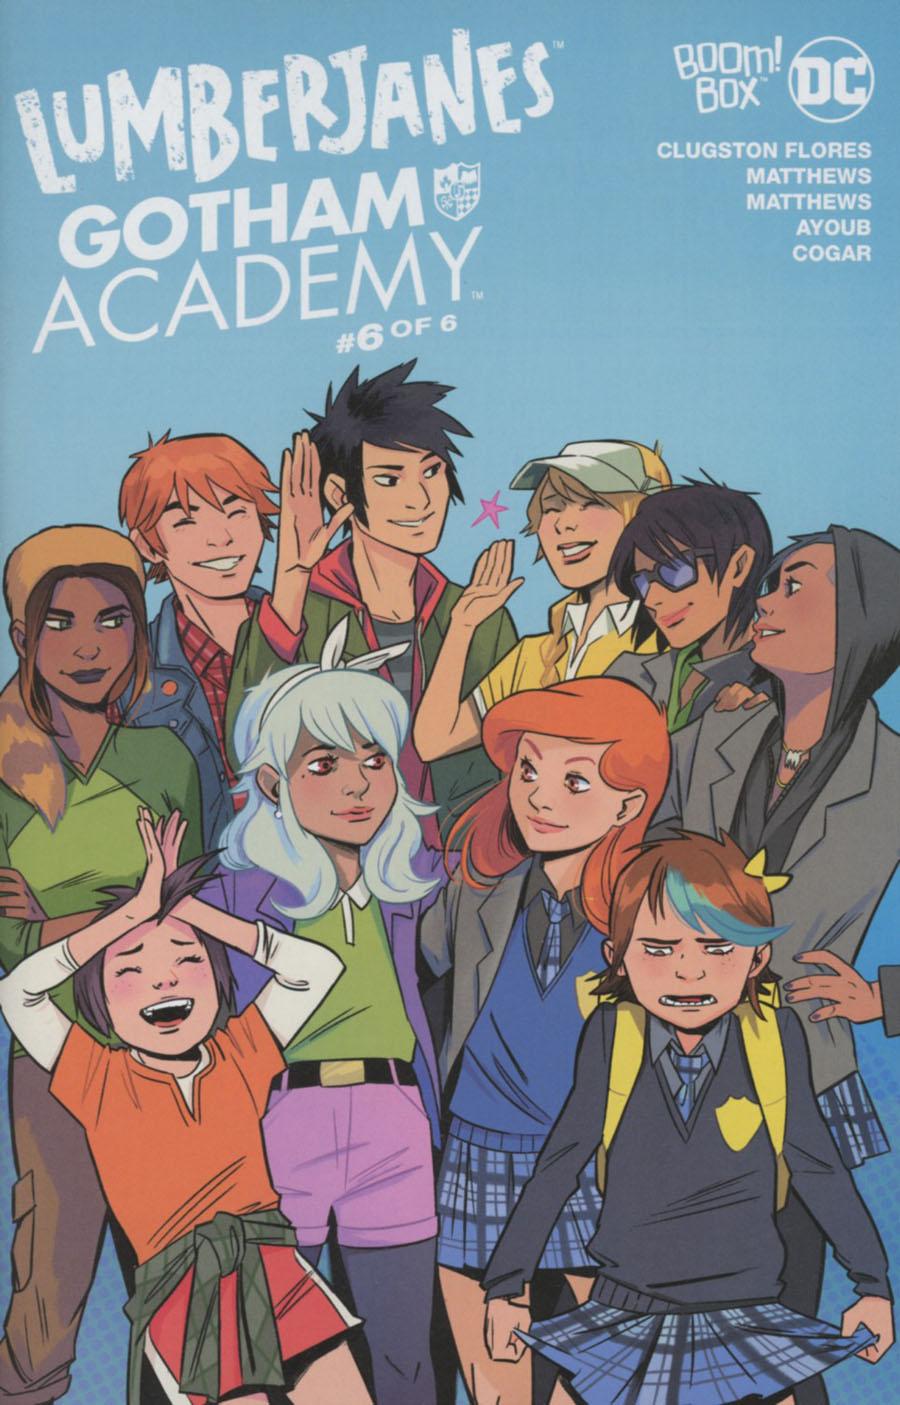 Lumberjanes Gotham Academy #6 Cover A Regular Natacha Bustos Cover